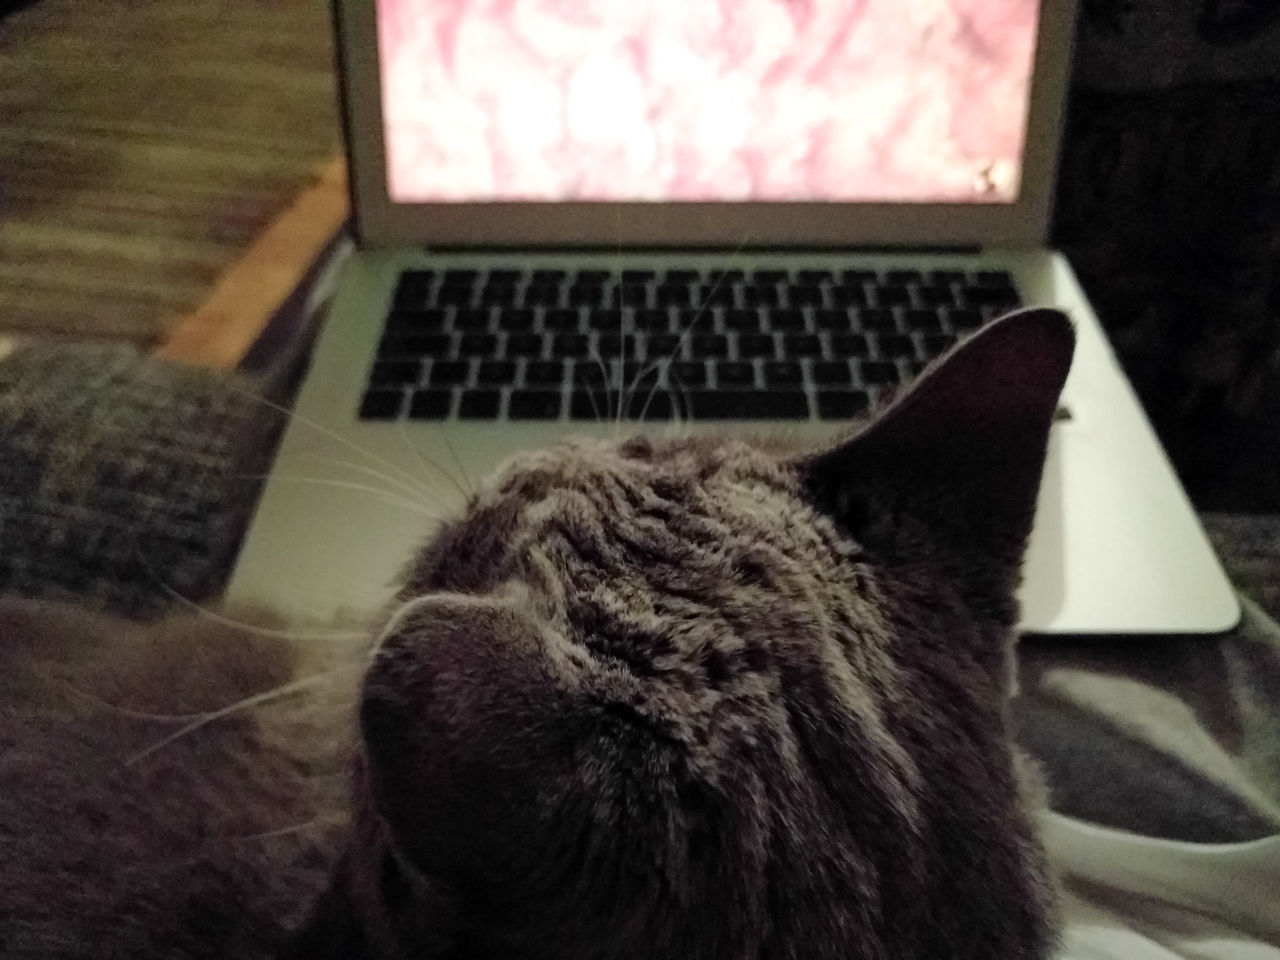 laptop, domestic cat, indoors, wireless technology, one animal, technology, mammal, feline, animal themes, no people, using laptop, pets, close-up, keyboard, day